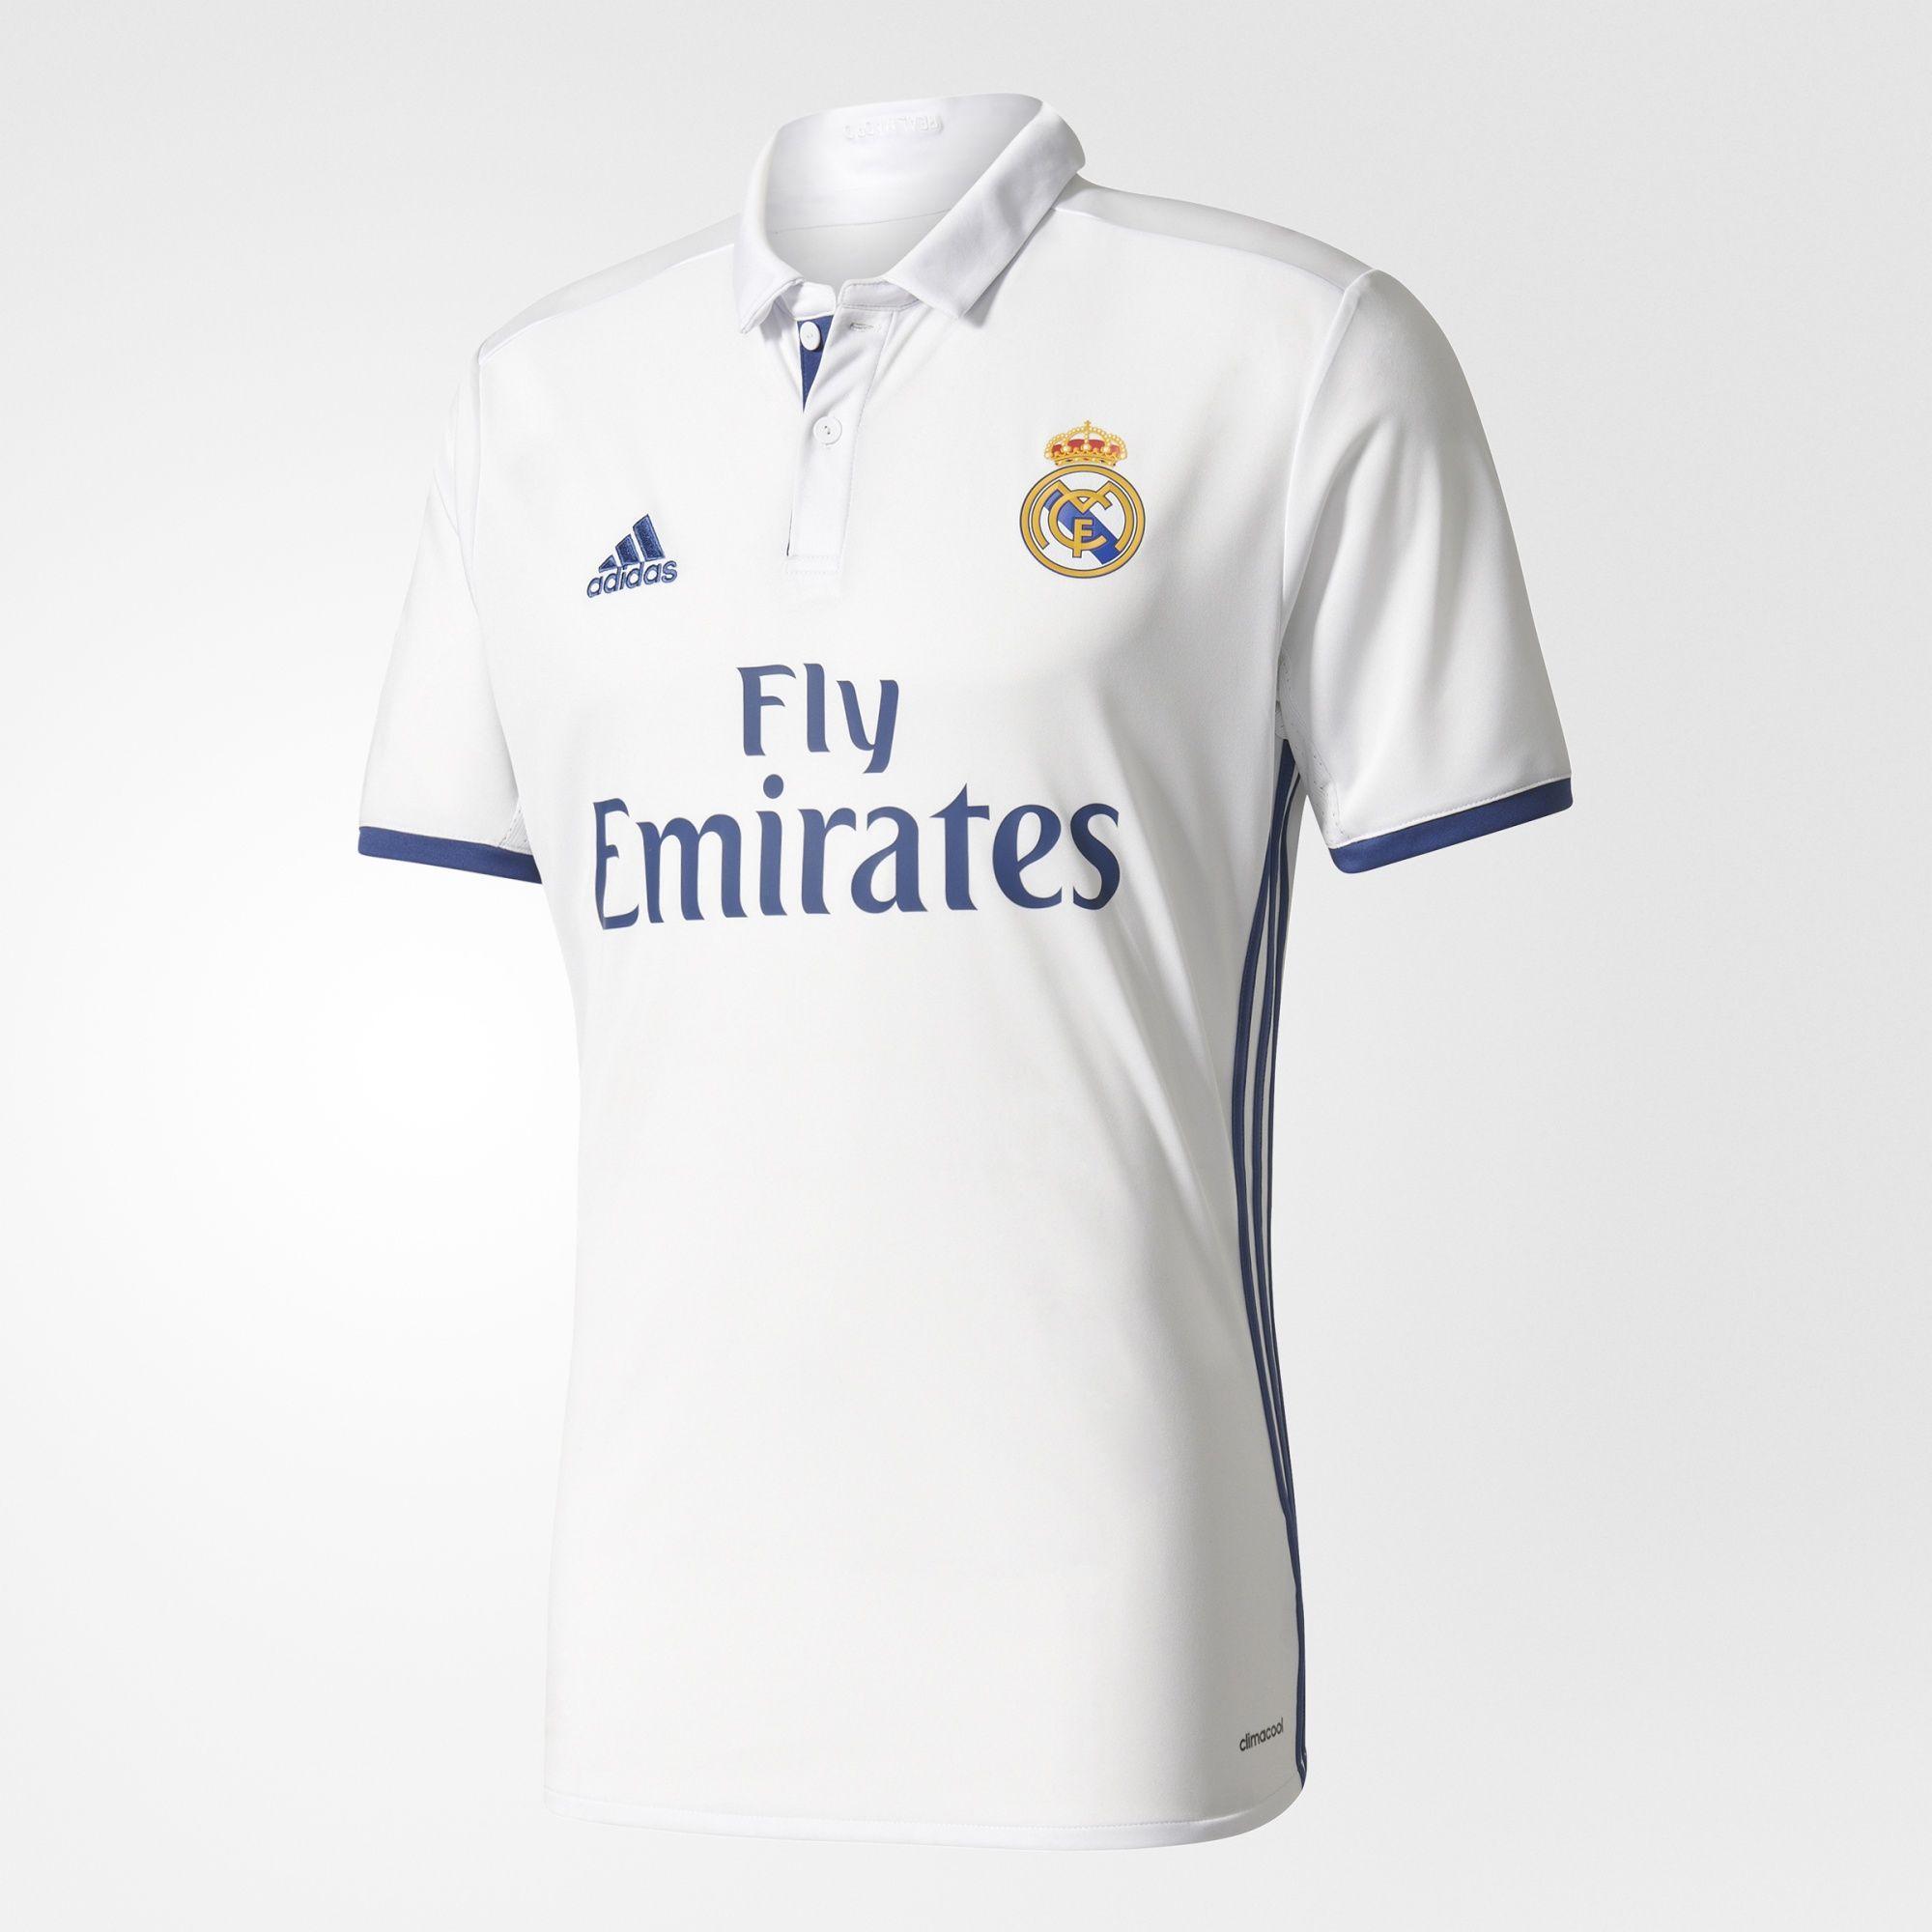 0b8066470c3aa 1ª Equipación Real Madrid CF 2016 2017 - Camiseta oficial para ...